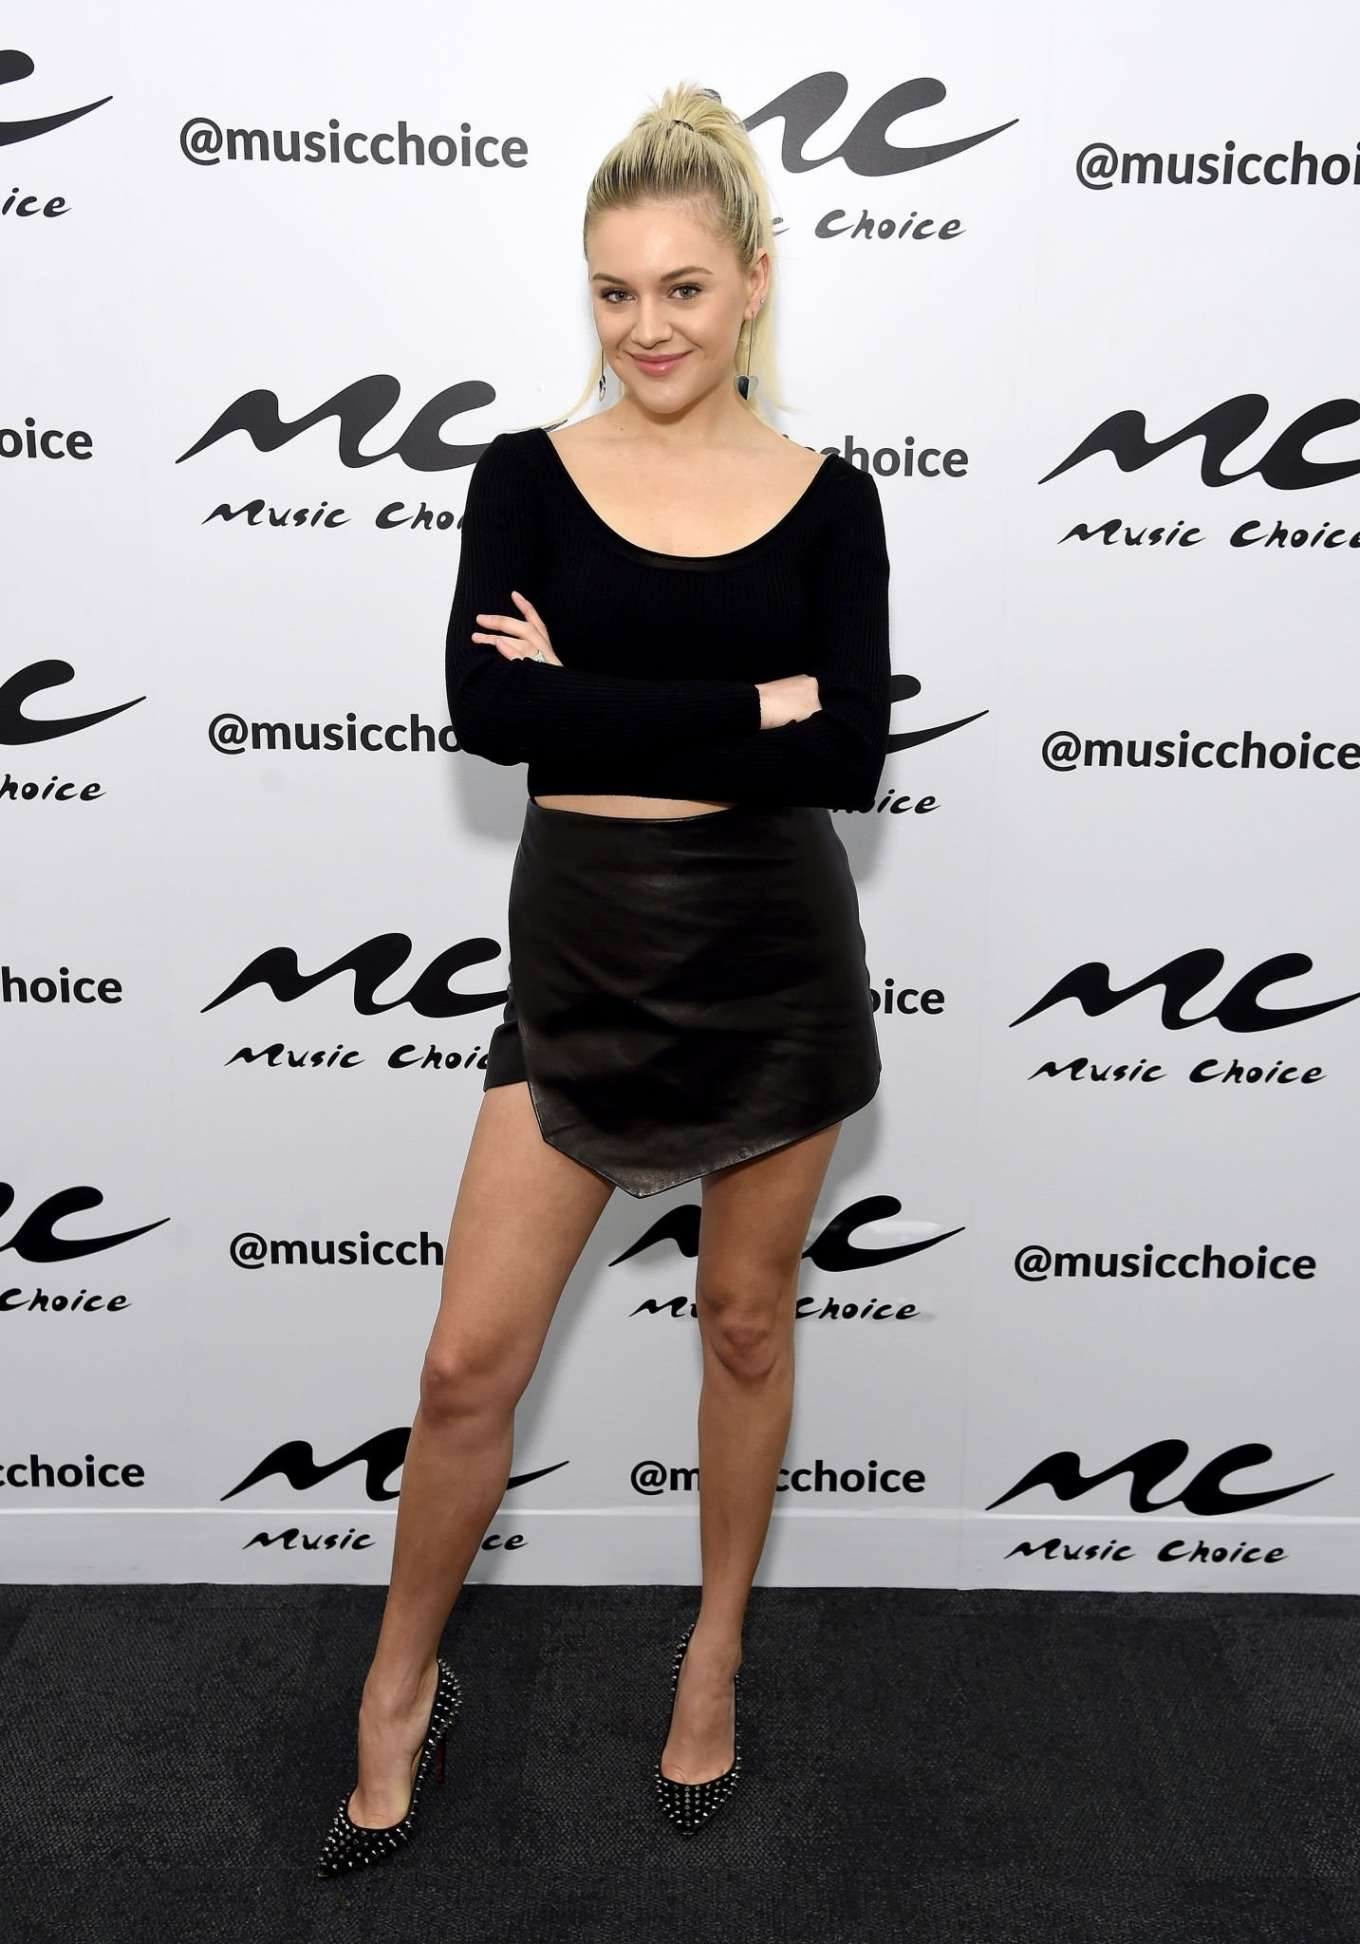 Kelsea Ballerini 2020 : Kelsea Ballerini visiting Music Choice in NYC-16